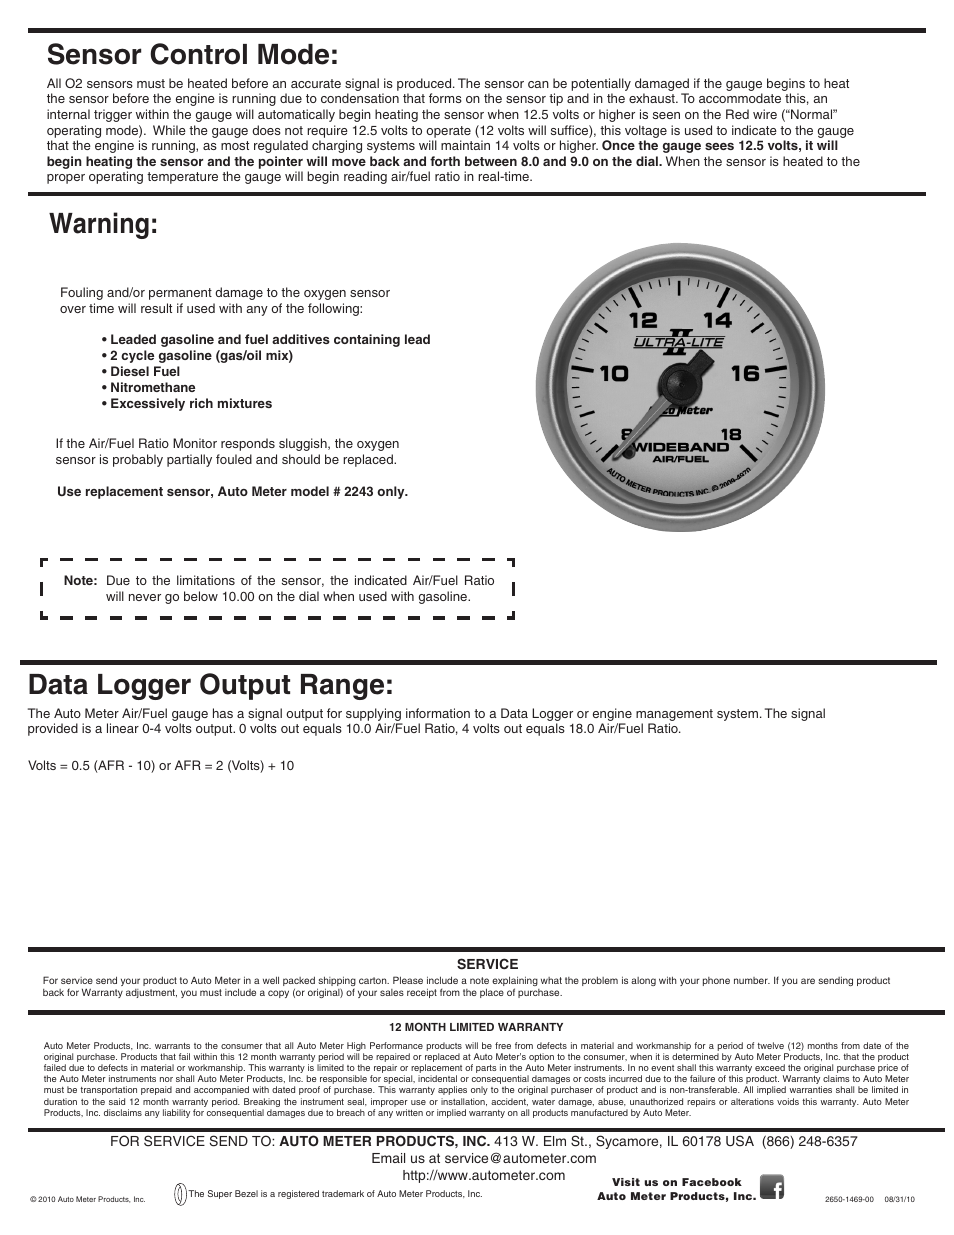 Sensor Control Mode  Warning  Data Logger Output Range